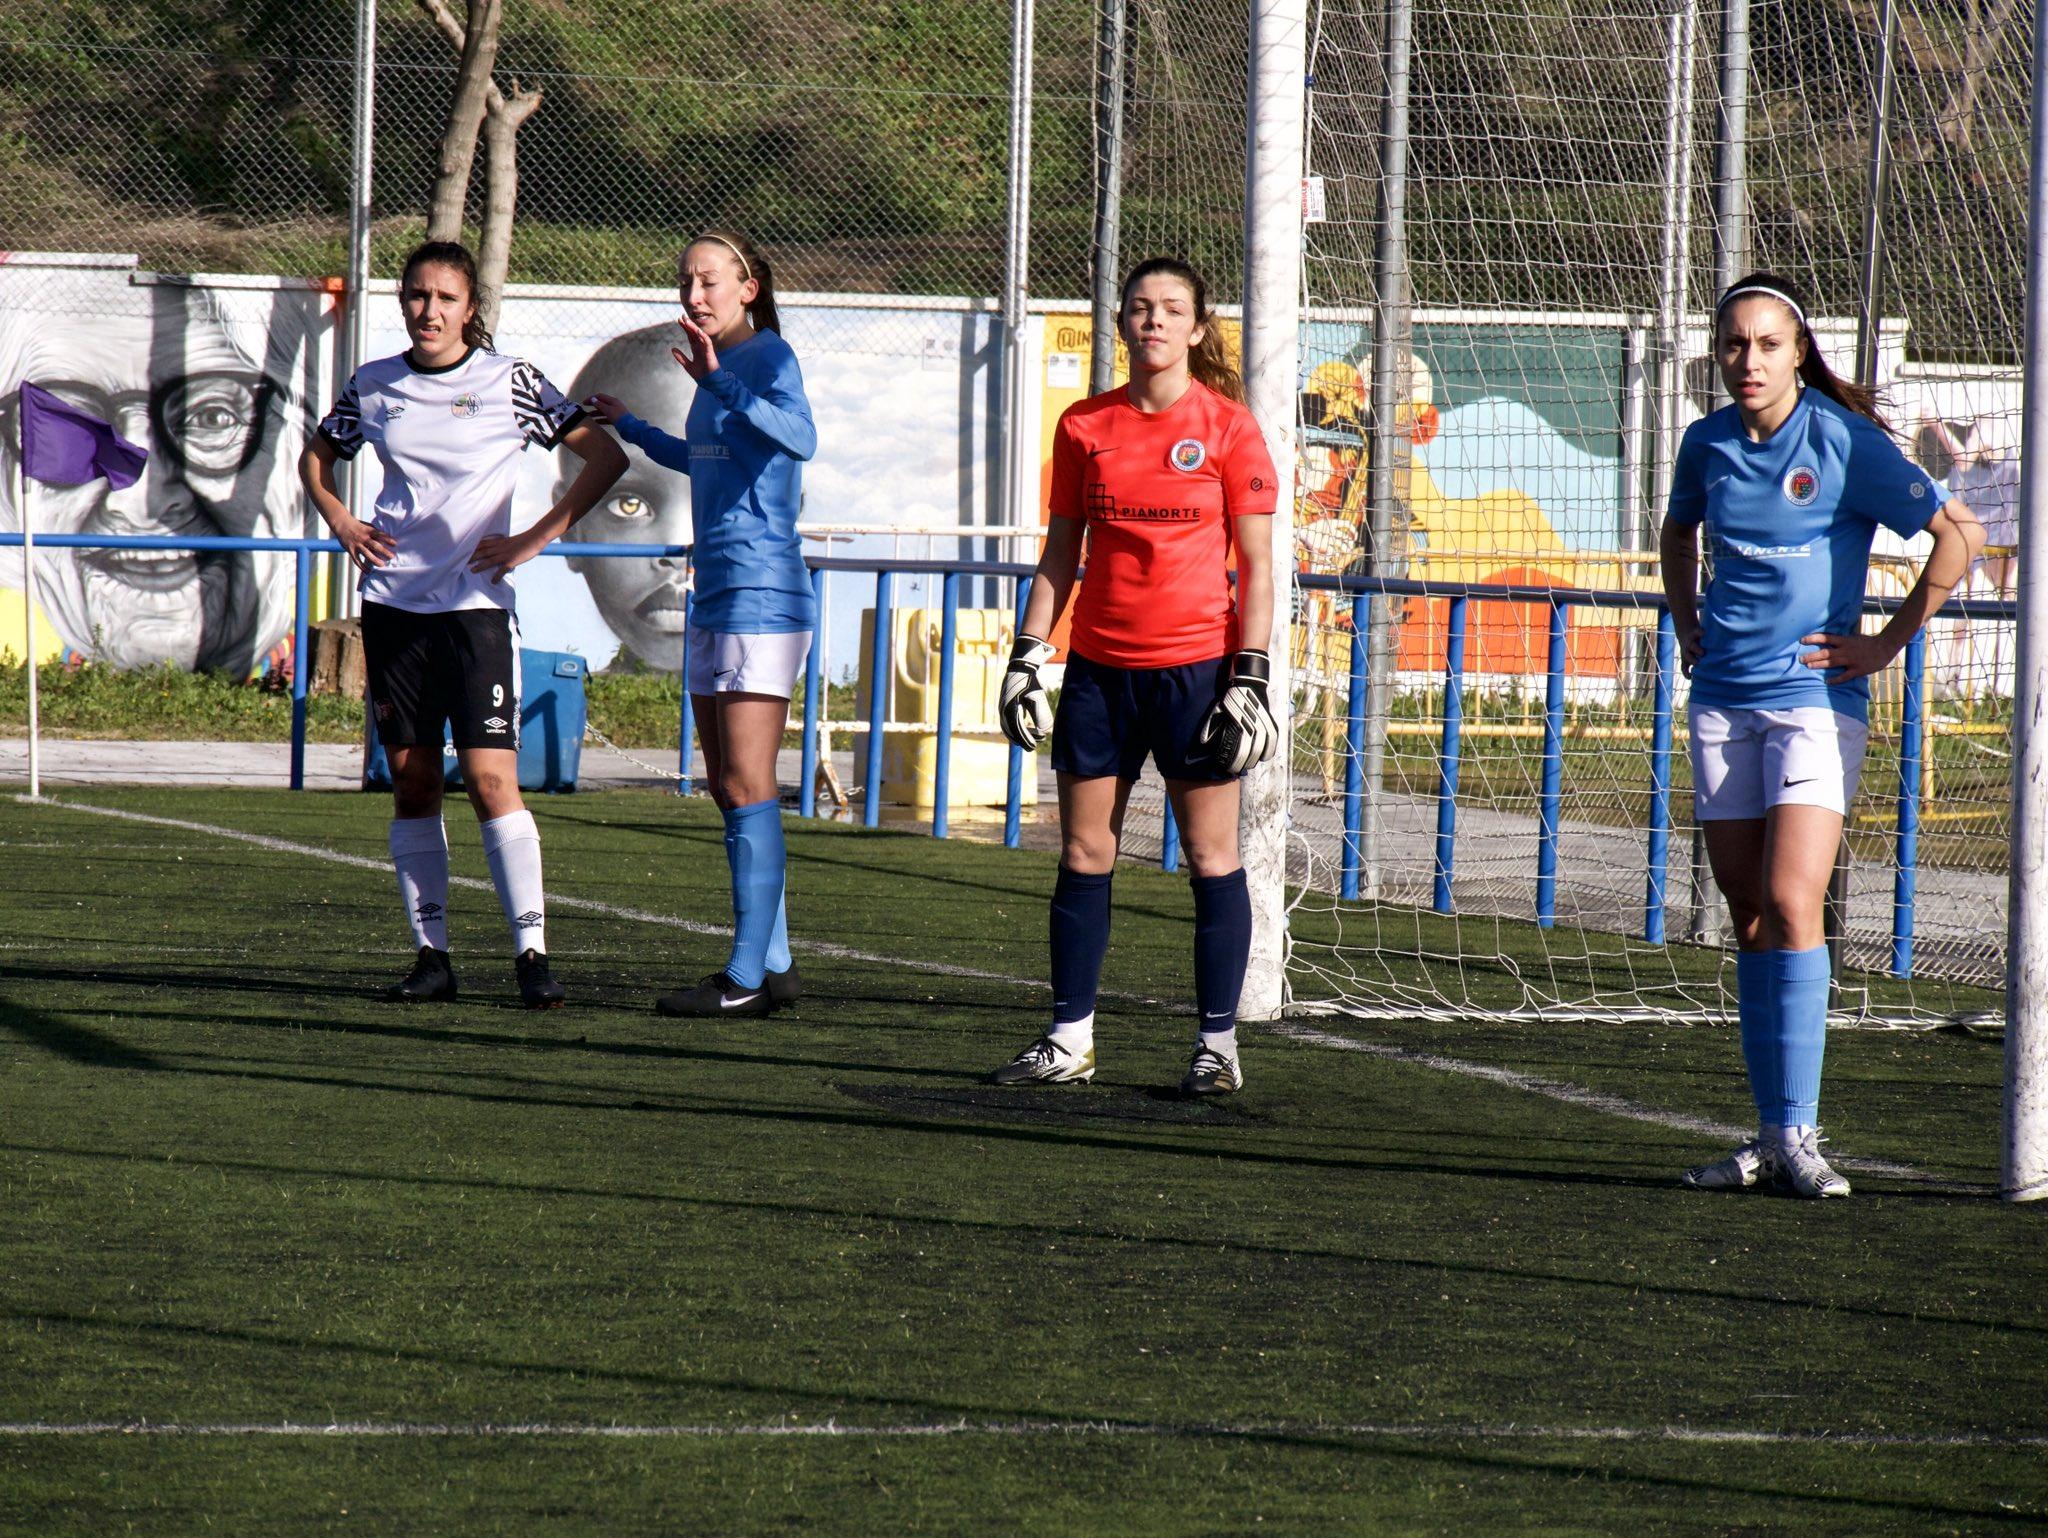 VÍDEO / Andrés Santana (RFFM) - CD Getafe - Salamanca 1-0 (Primera Nacional Femenina - Gr. 5 - Jornada 13)